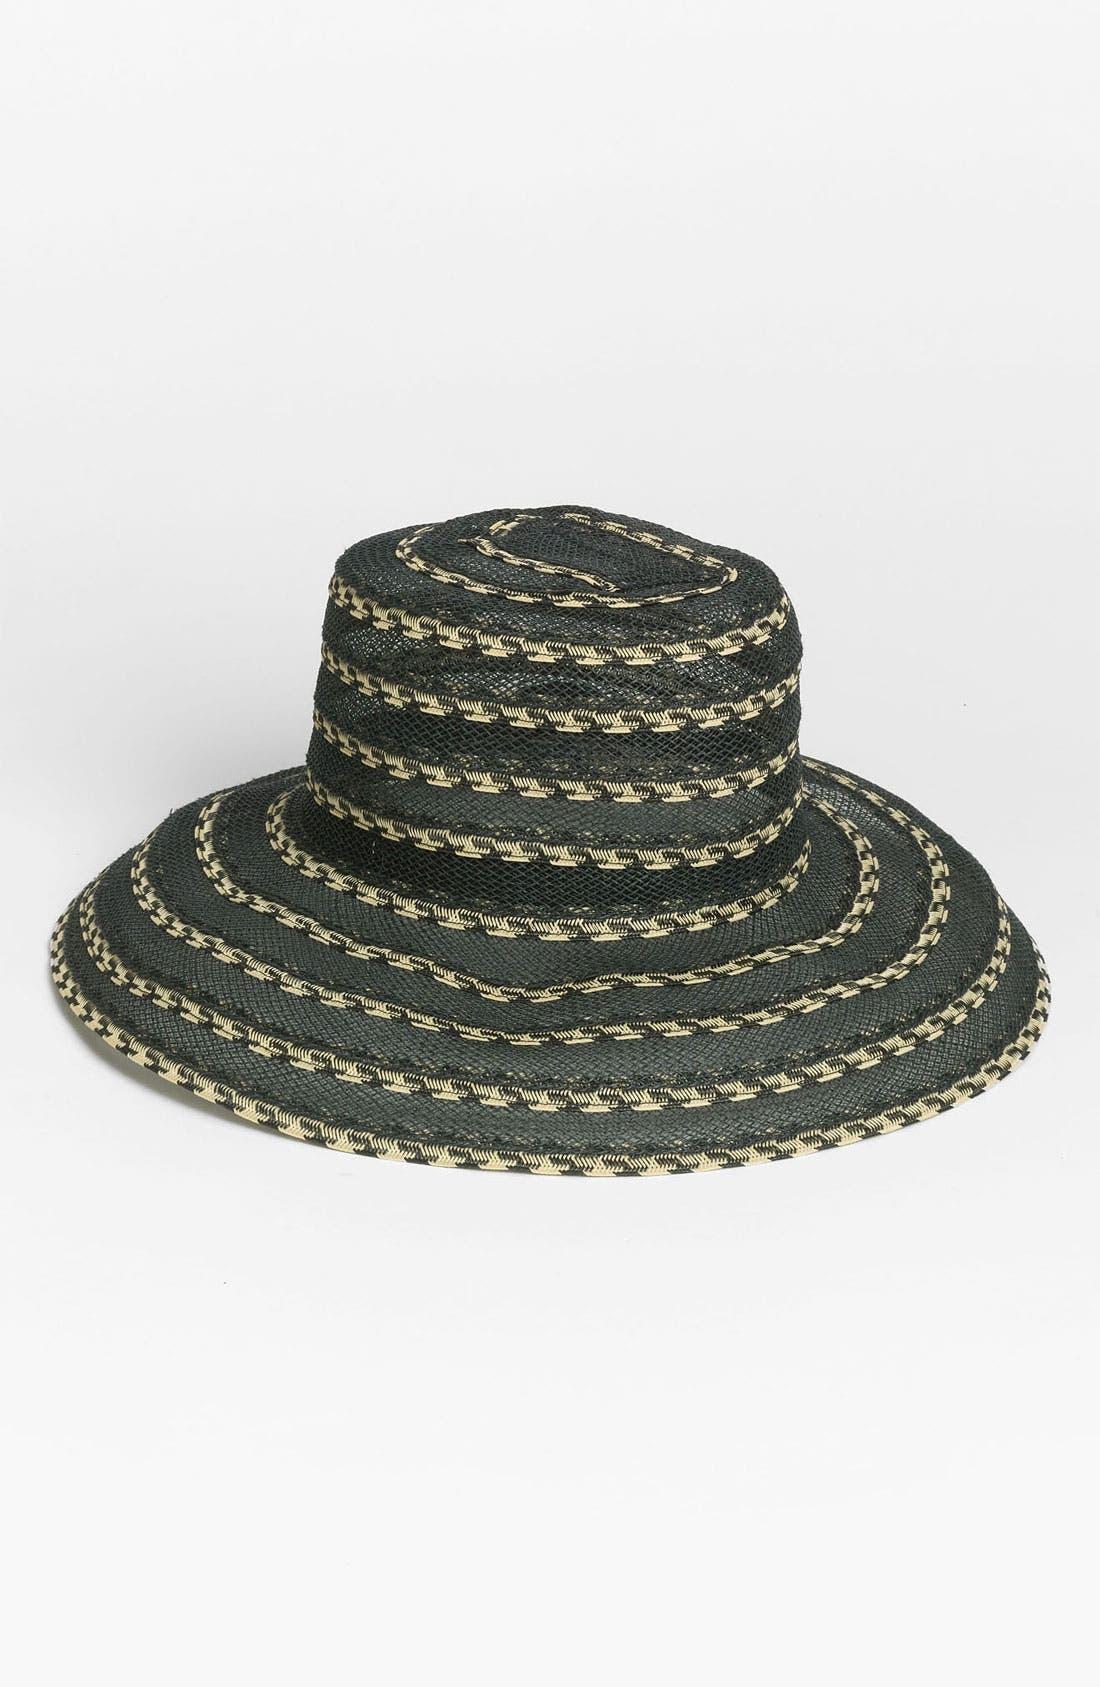 Alternate Image 1 Selected - Nordstrom Medium Brim Sheer Hat